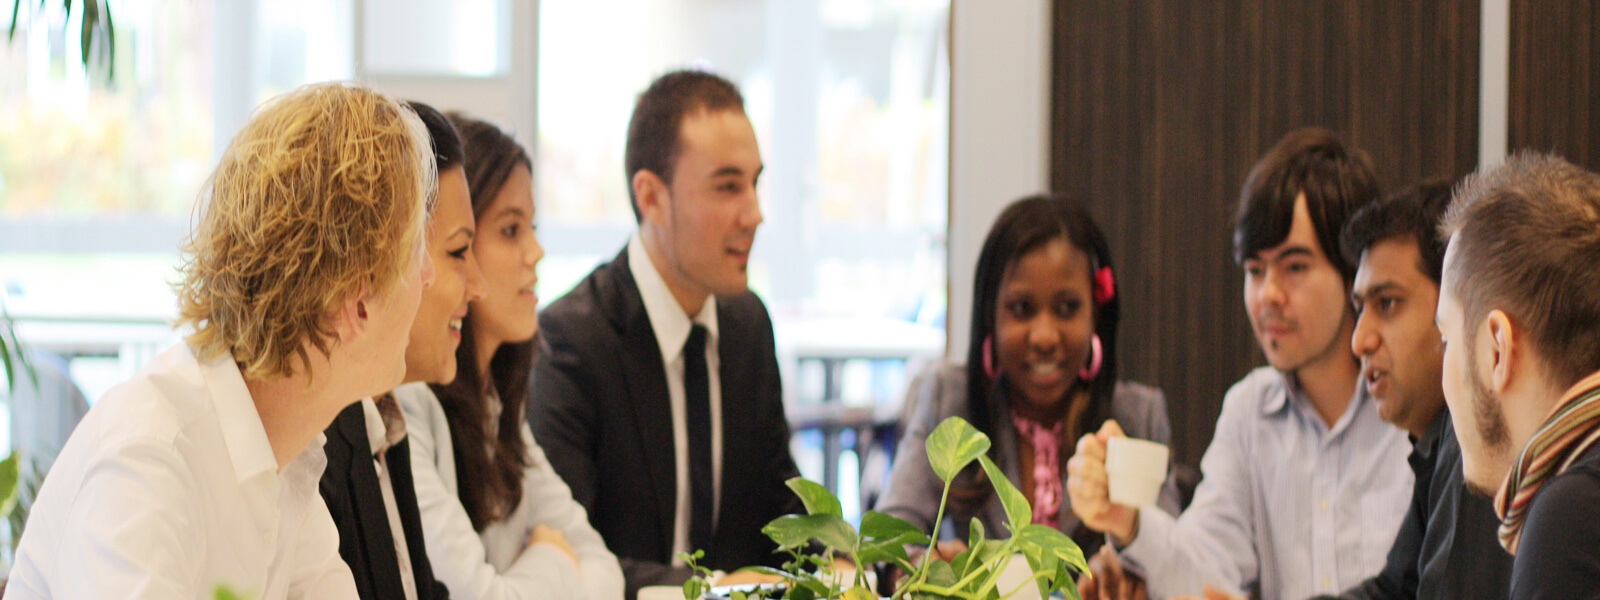 master-international event management management- studyinholland-universitiesofappliedsciences-wittenborg-apeldoorn-holland